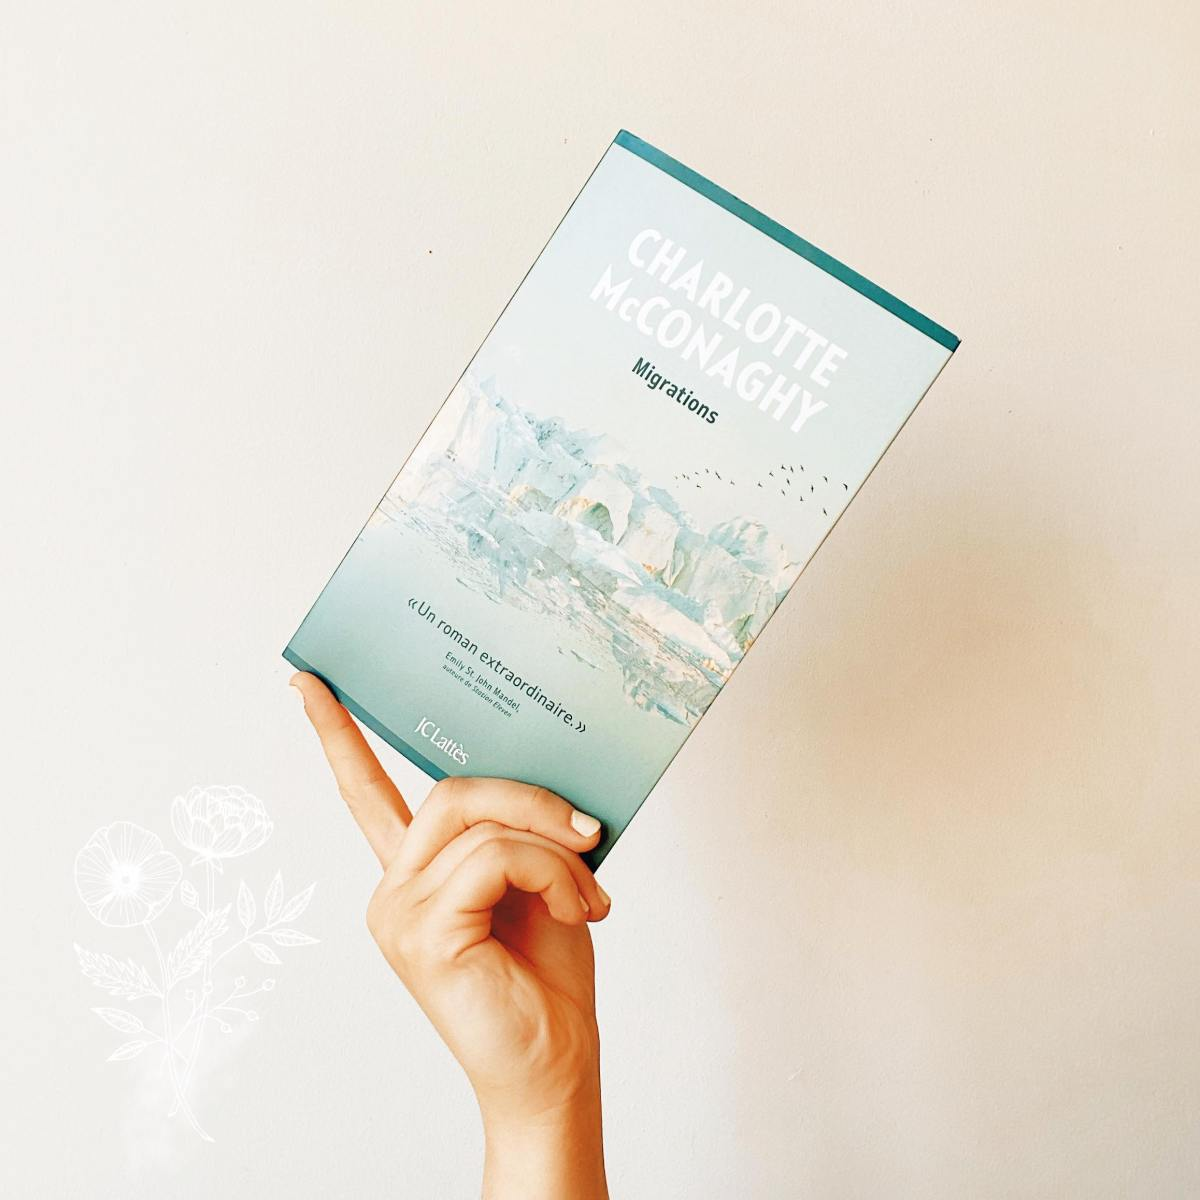 Migrations Charlotte McConaghy Trouble Bibliomane